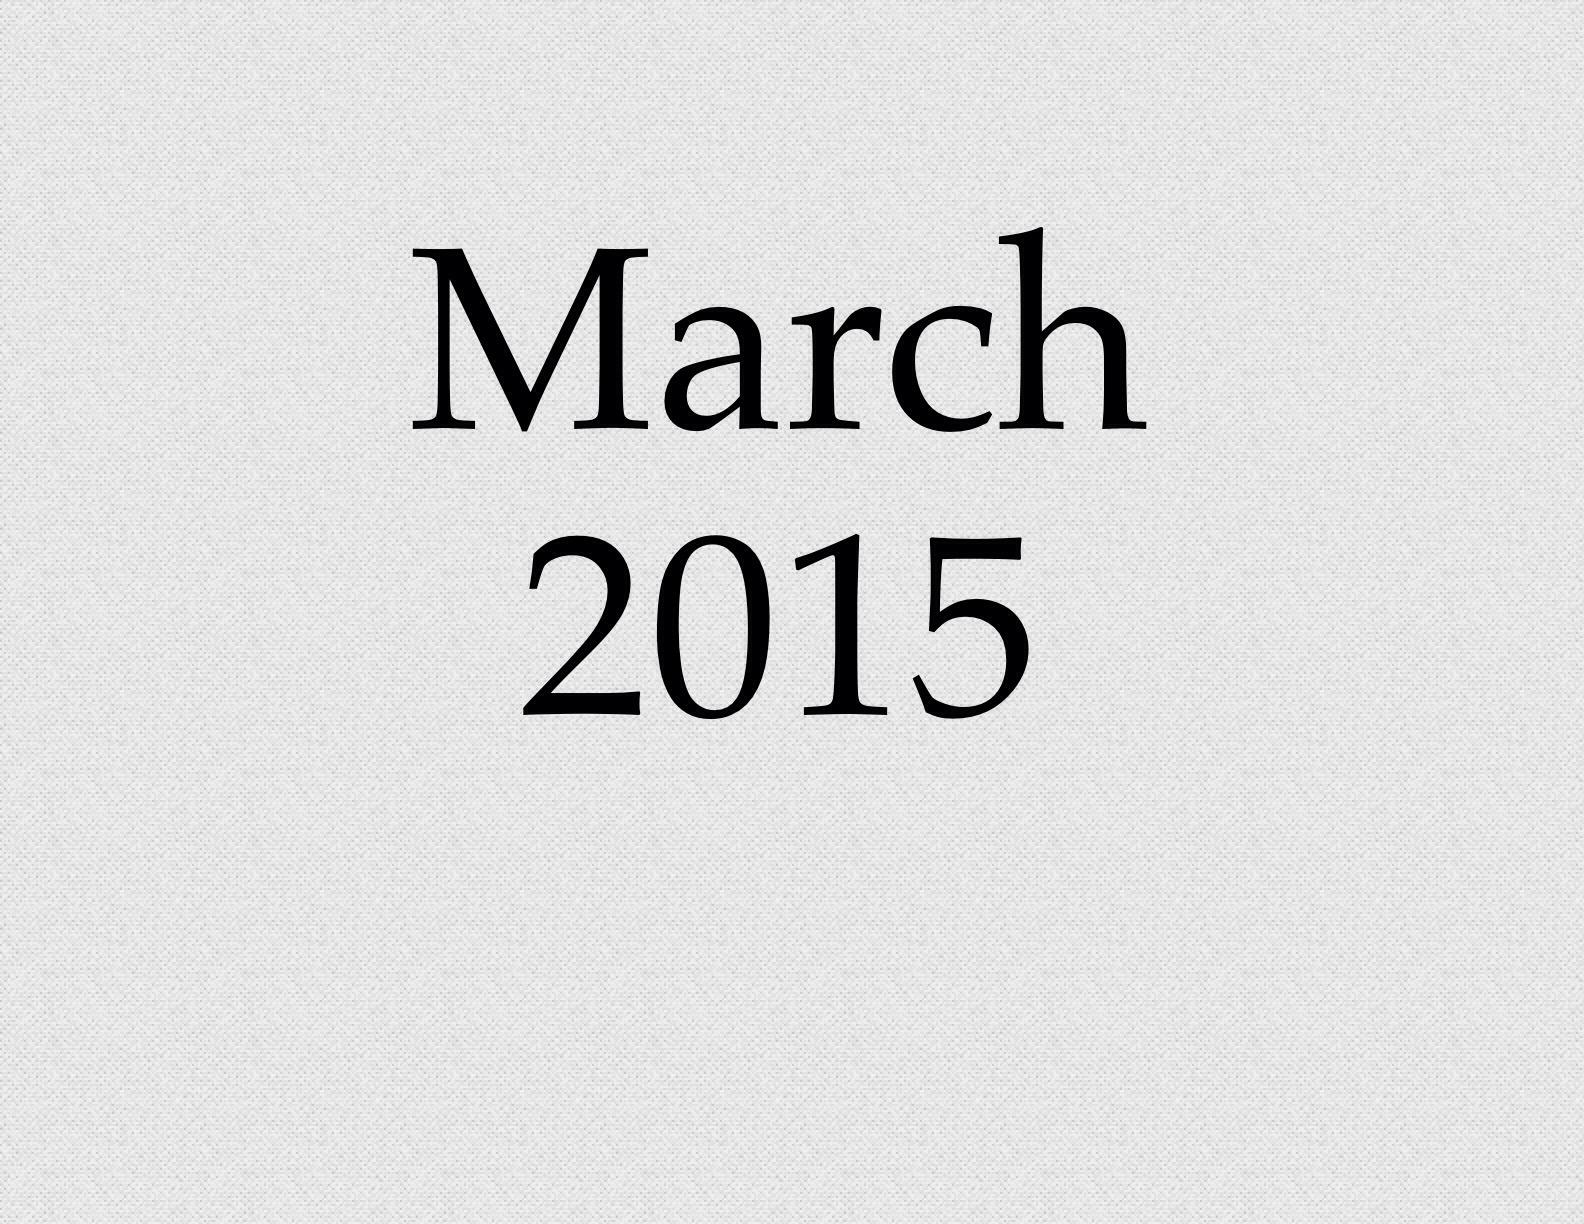 Photo Mar 04, 12 50 54 PM.jpg